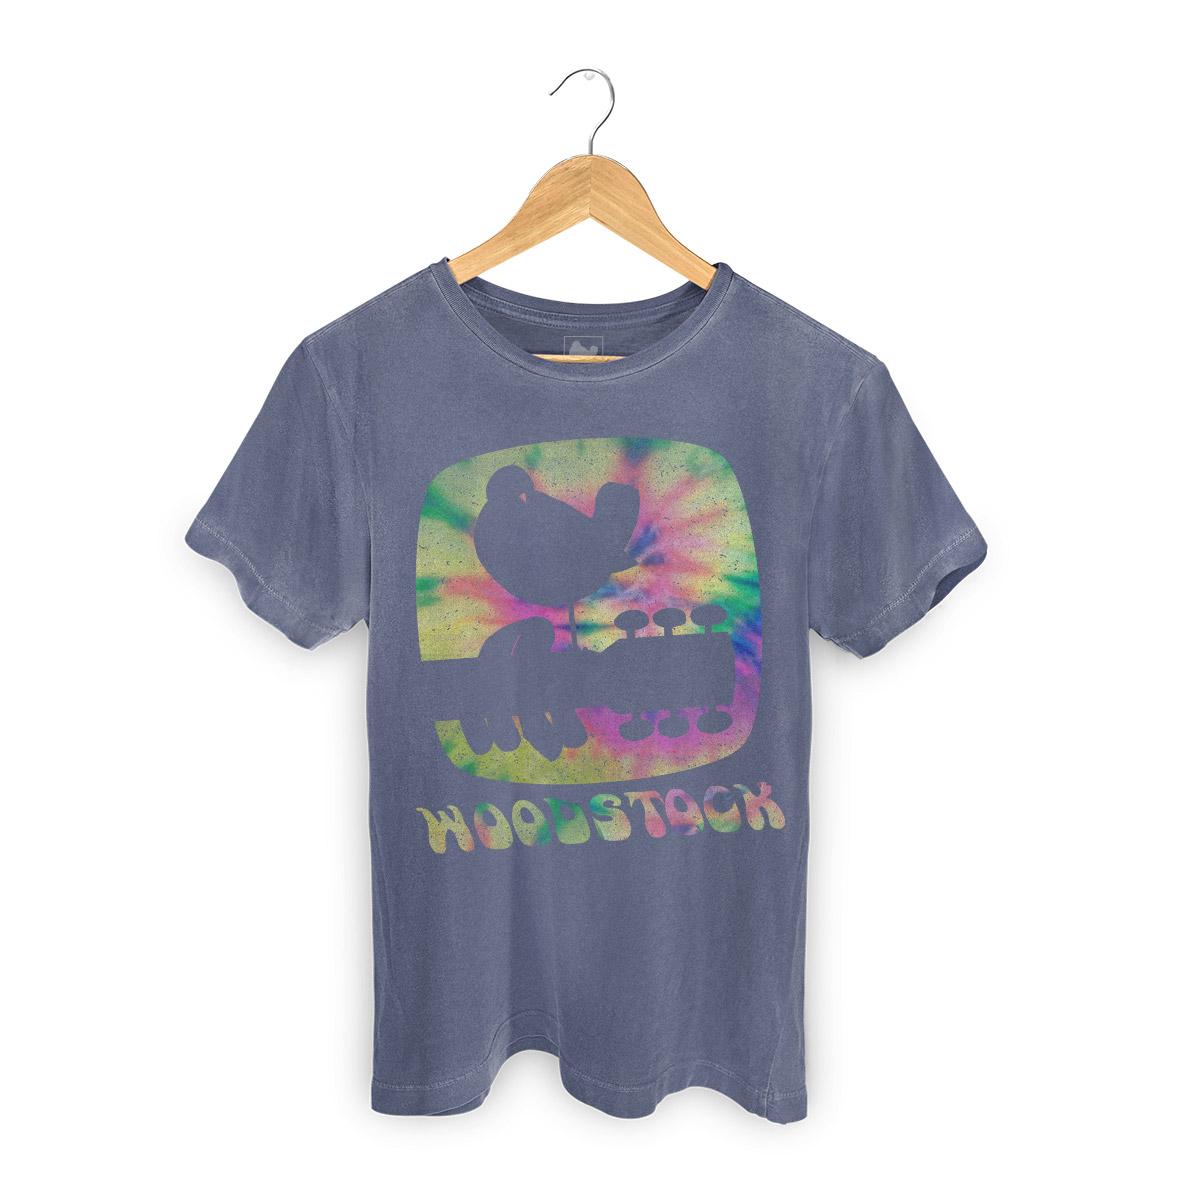 T-shirt Premium Masculina Woodstock Color Explosion